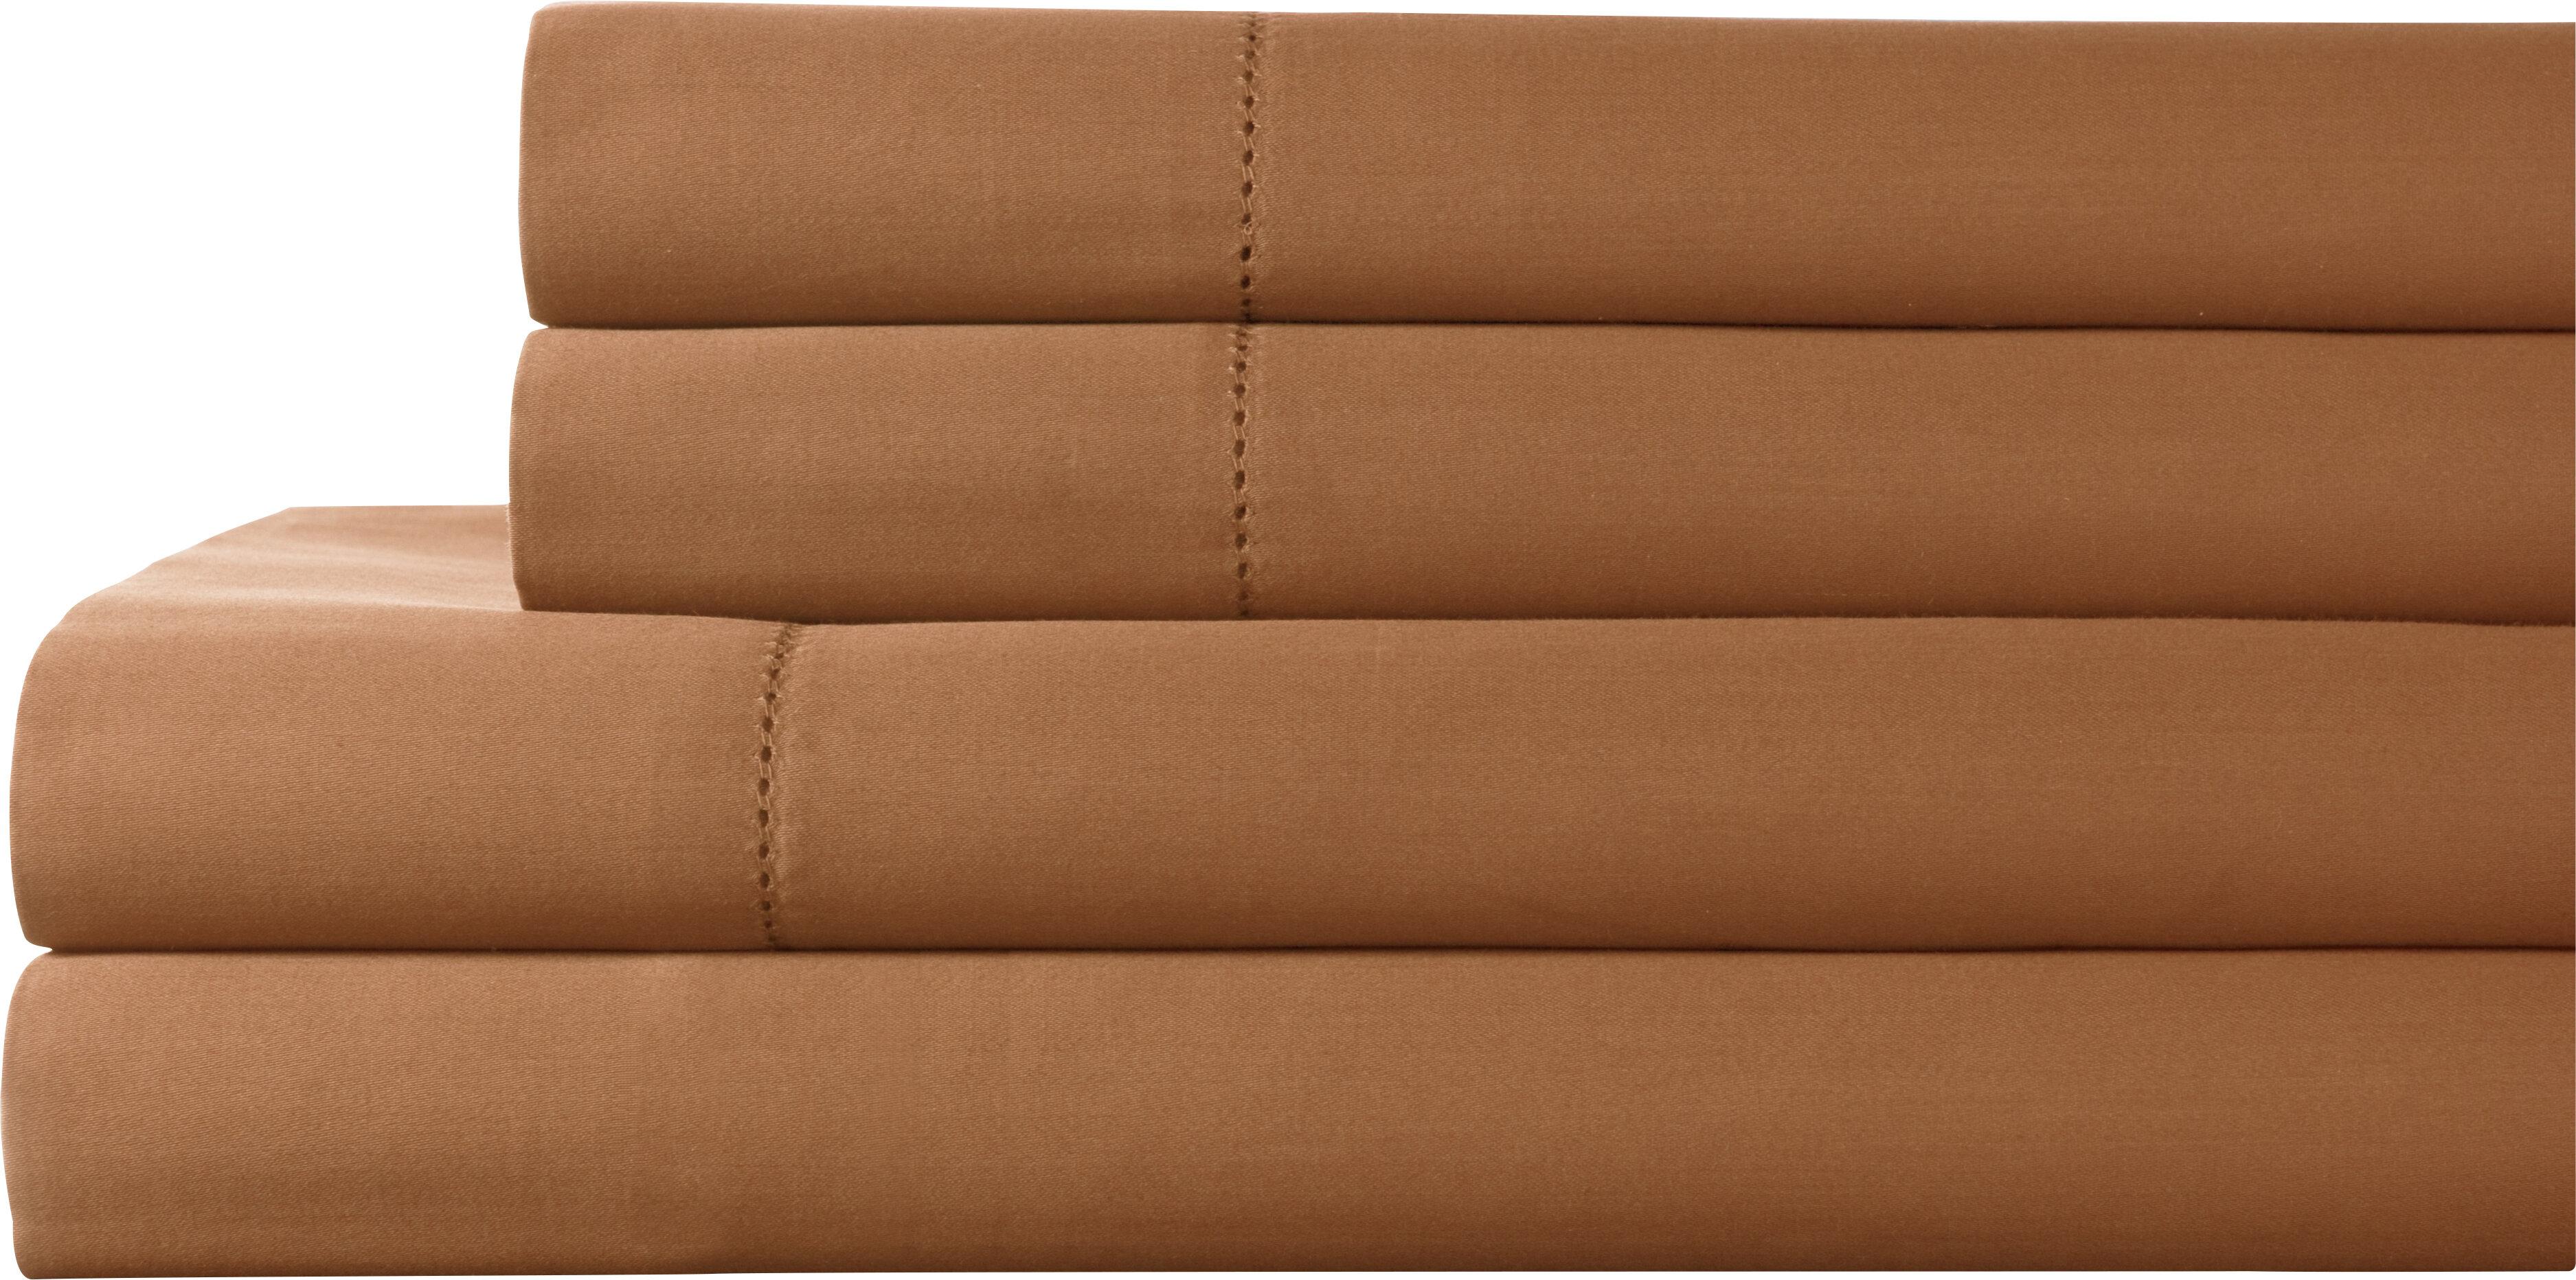 8b6b51788a6 Elite Home Products Tuxedo 325 Thread Count 100% Pima Cotton Sheet Set    Reviews